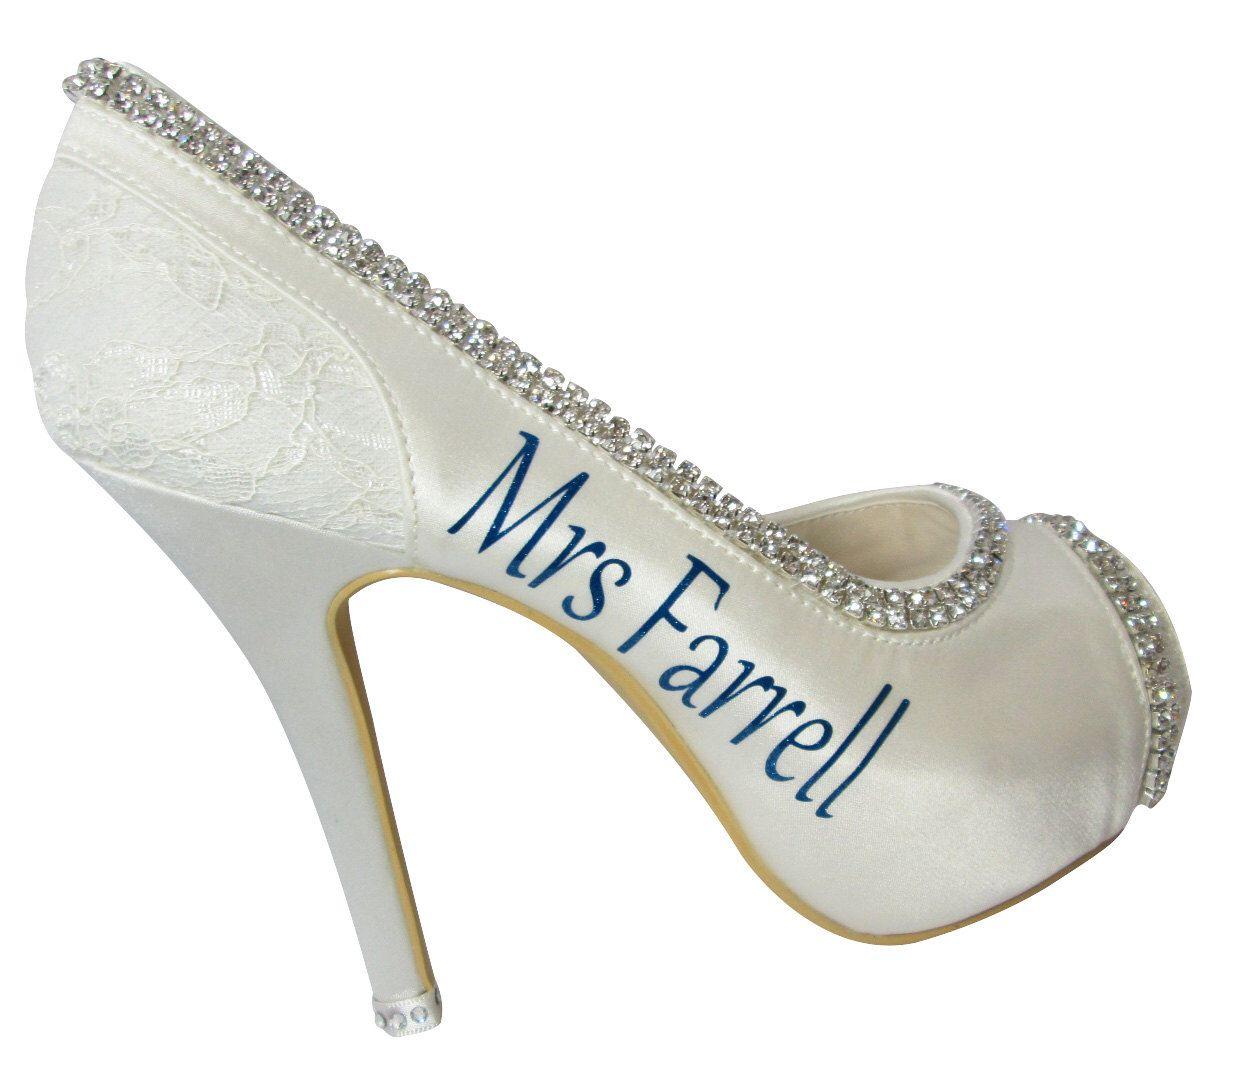 6a1146f39941 Name   Wedding Date High Bridal Heels - 4.5 inch